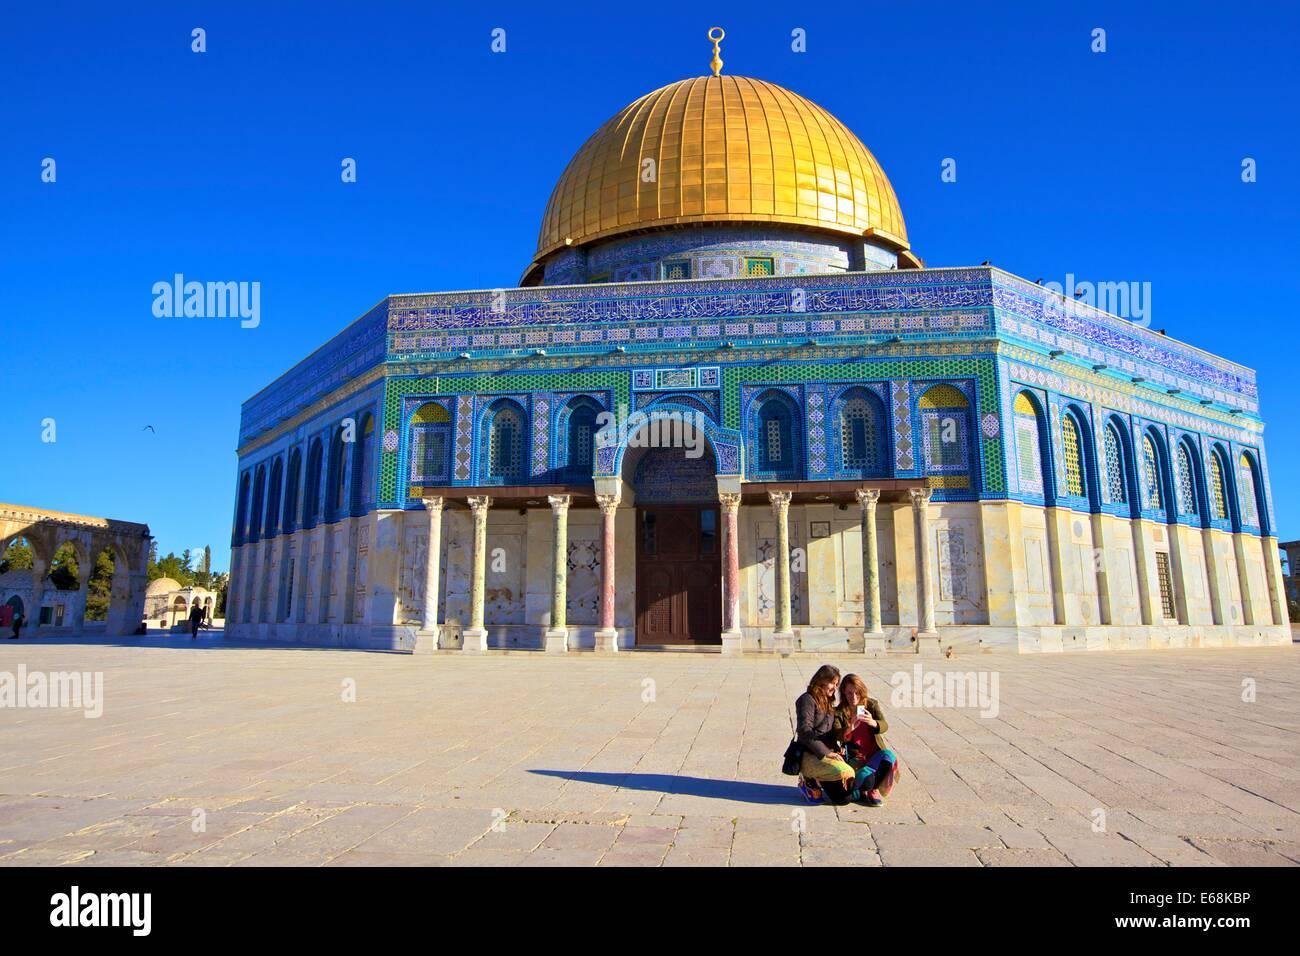 Monte del Tempio, Gerusalemme, Israele, Medio Oriente Immagini Stock